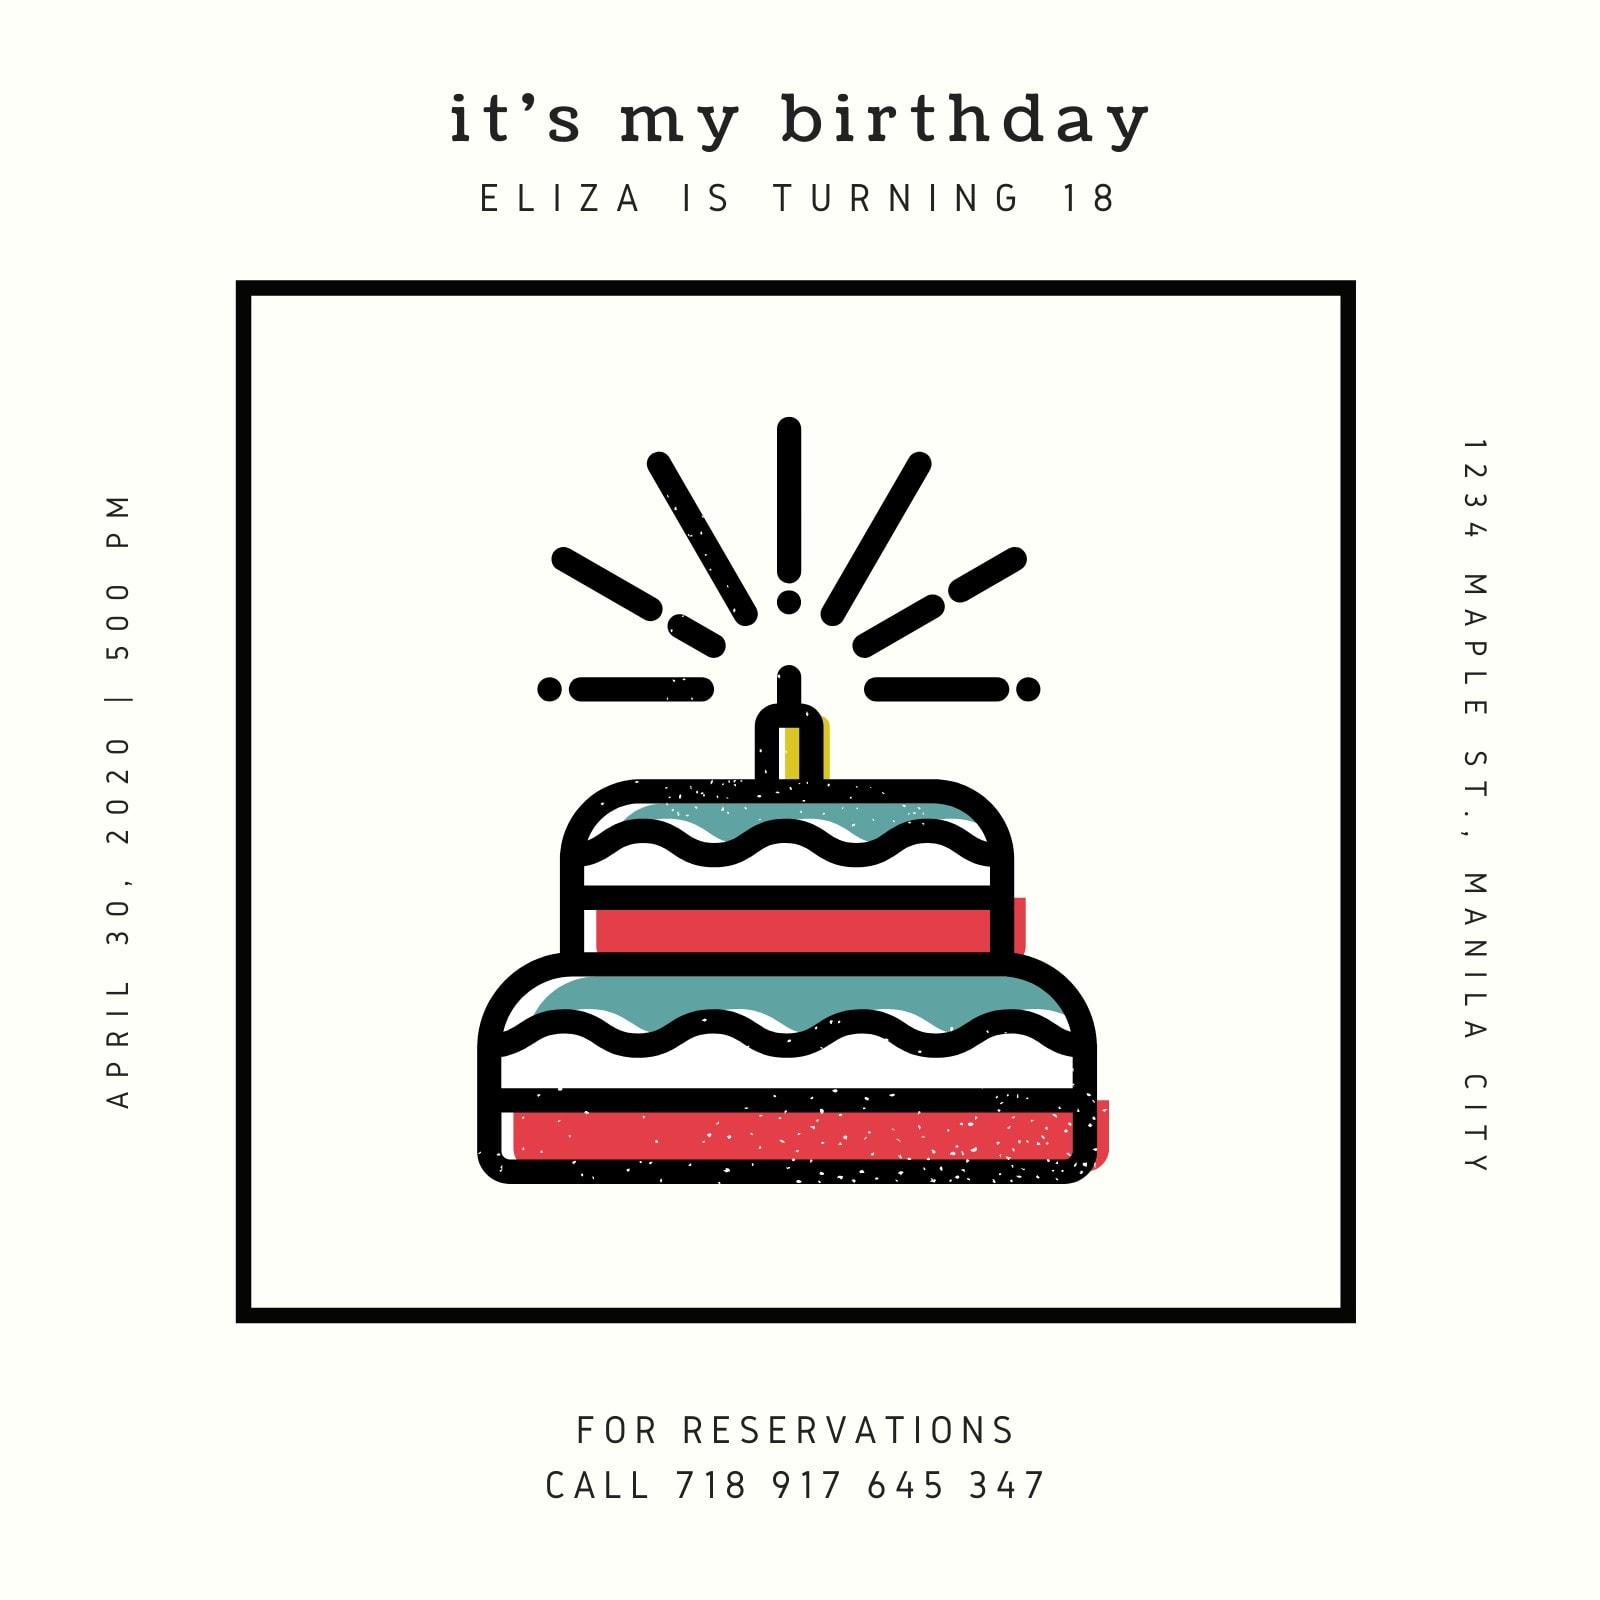 Cream and Black Cake Bordered Birthday Invitation